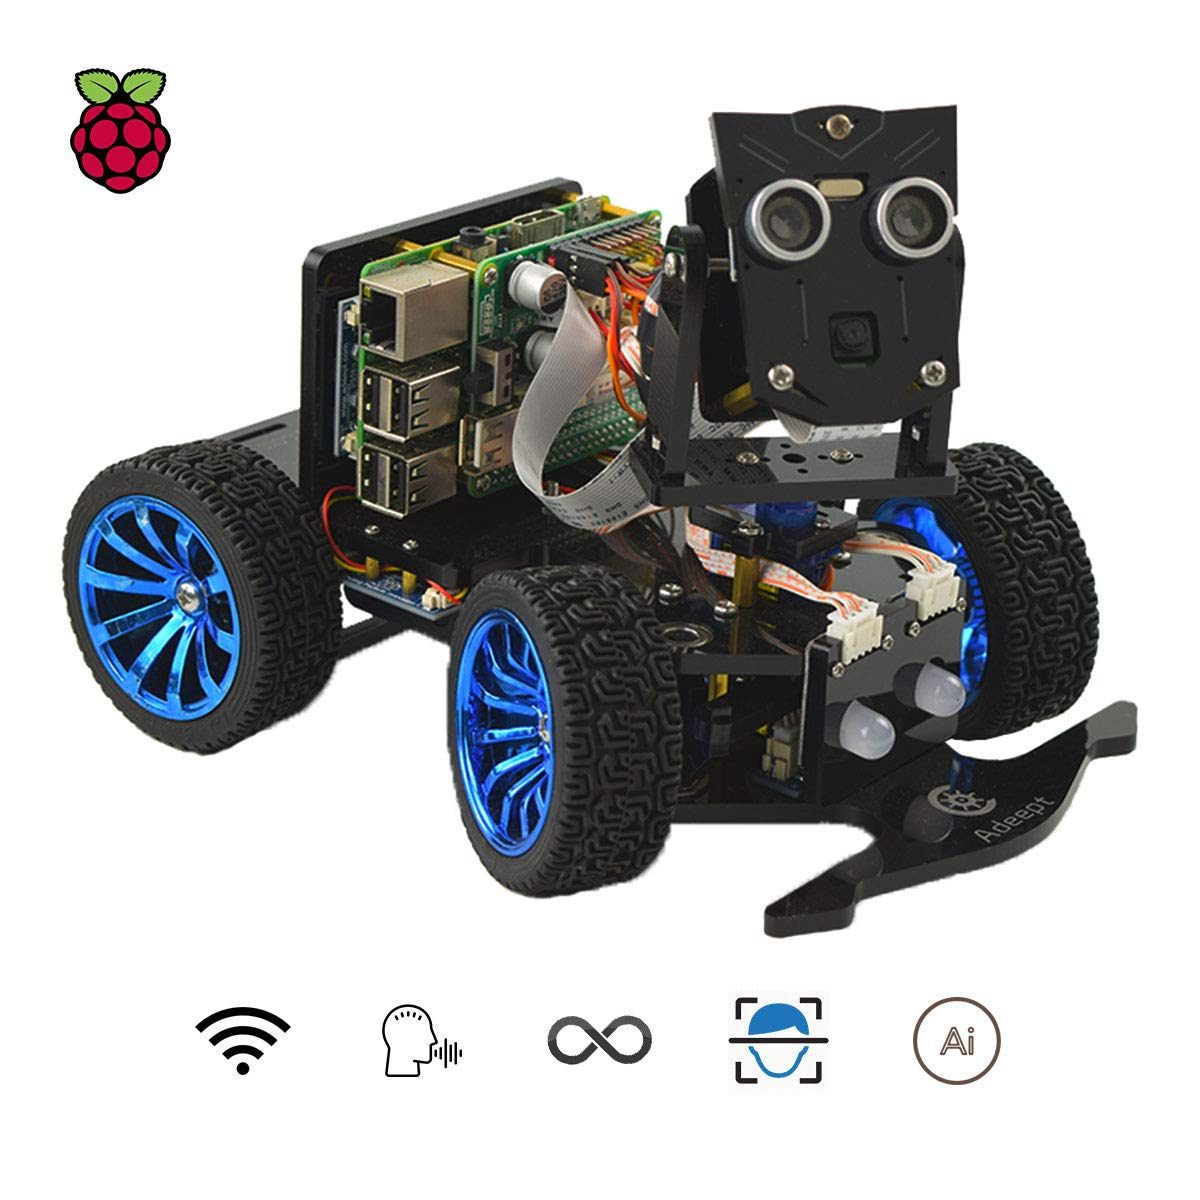 Adeept Mars Rover PiCar-B WiFi Smart Robot Car Kit for Raspberry Pi 3 Model B+/B/2B